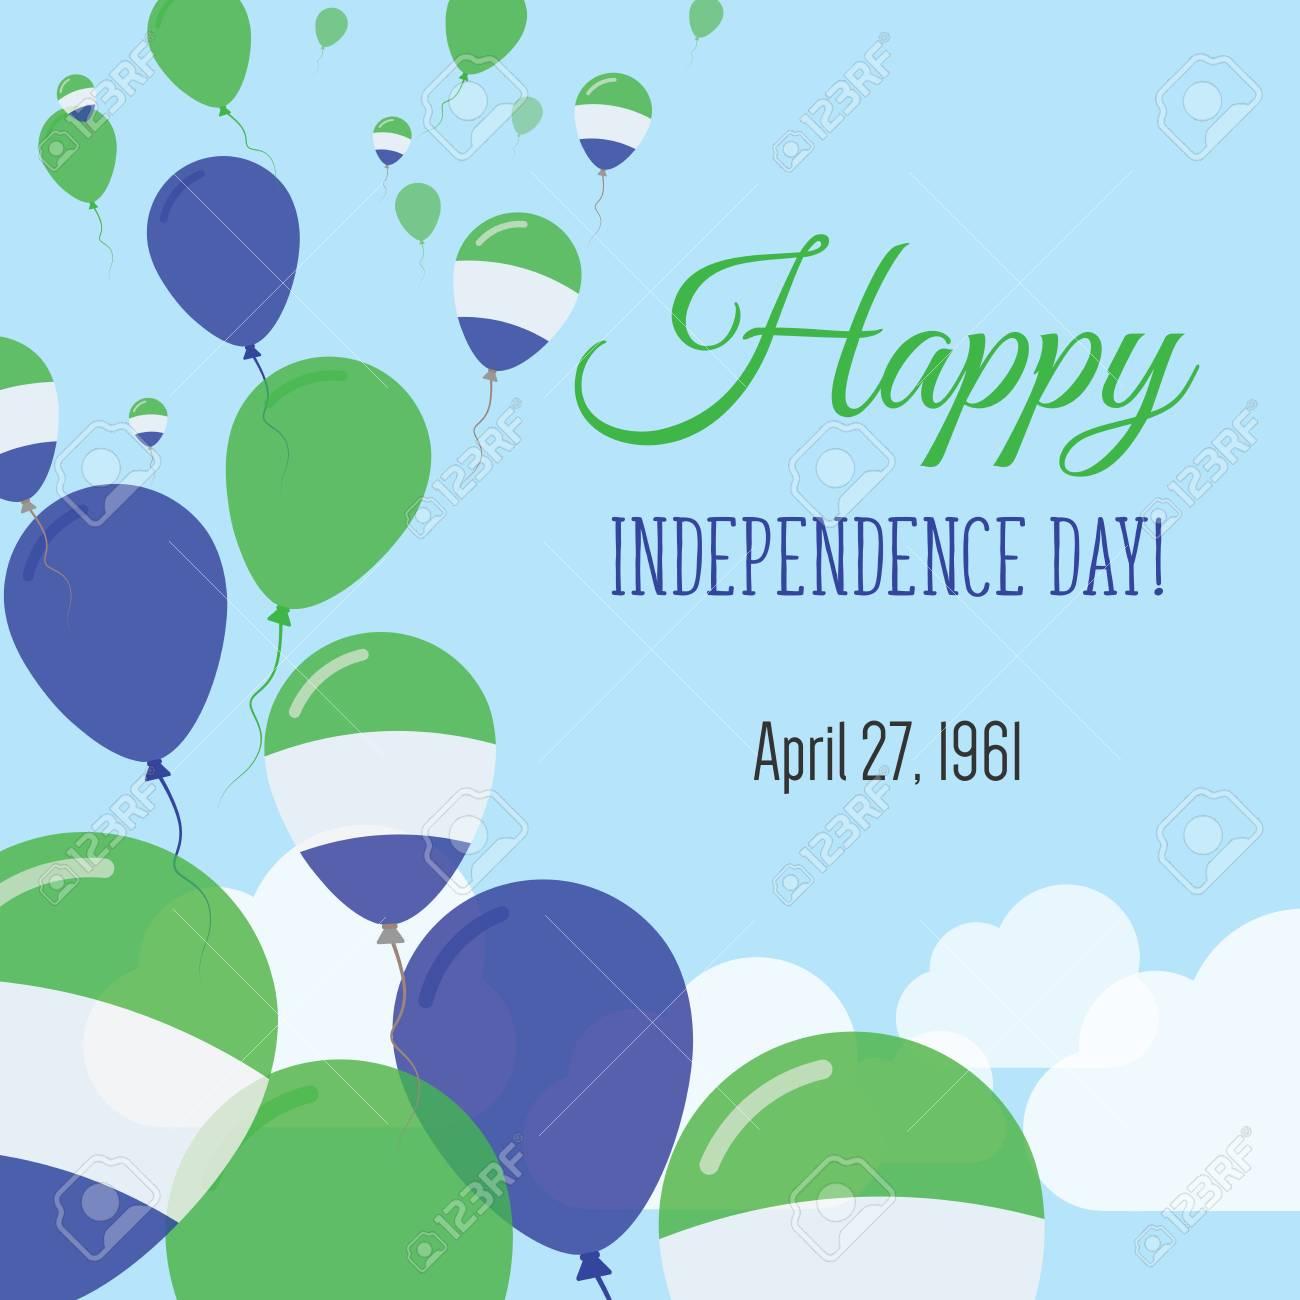 No Independence Celebrations